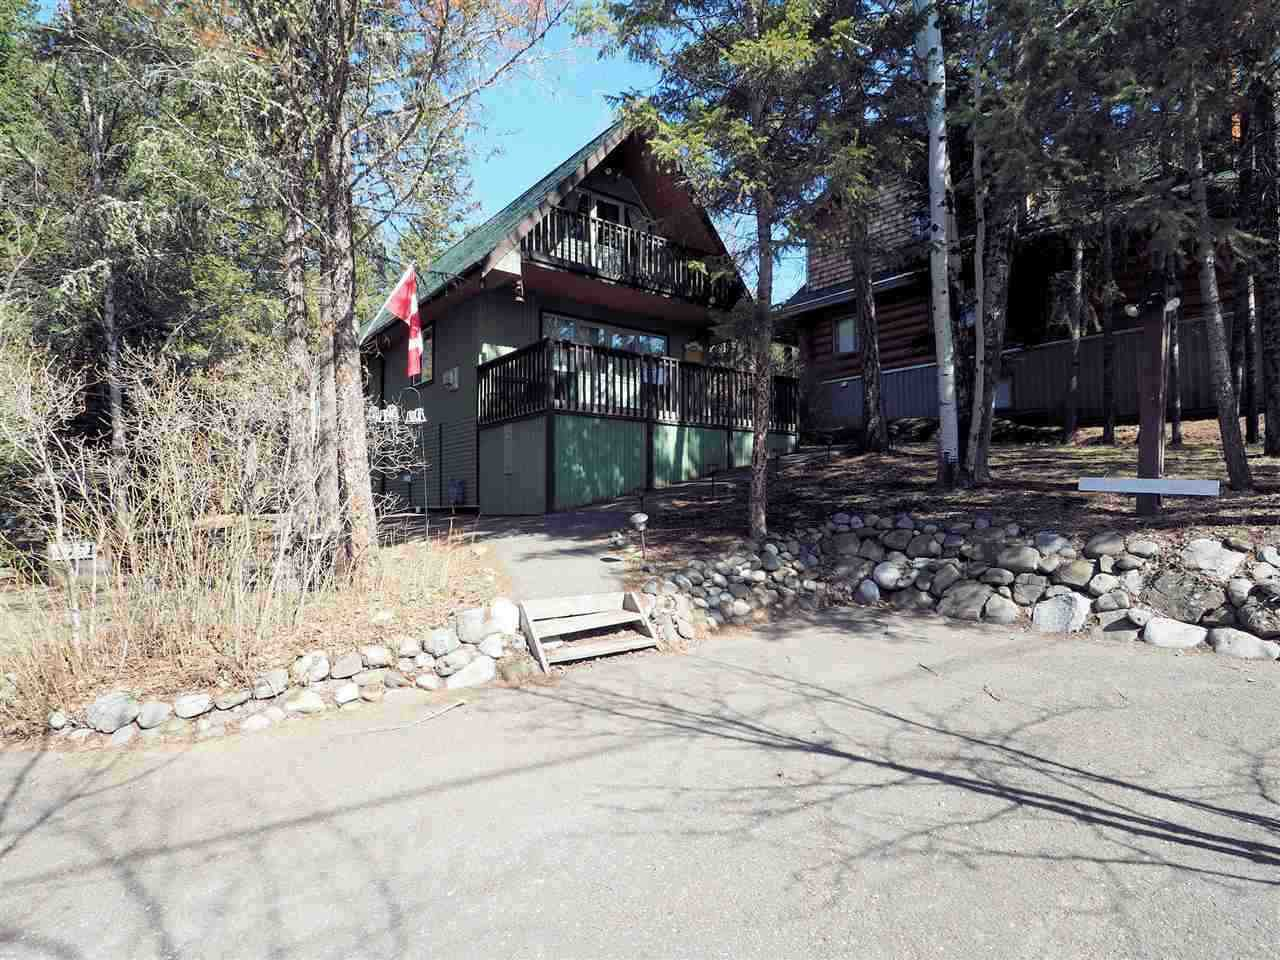 Main Photo: 3751 EMERALD Crescent: Lac la Hache House for sale (100 Mile House (Zone 10))  : MLS®# R2464597